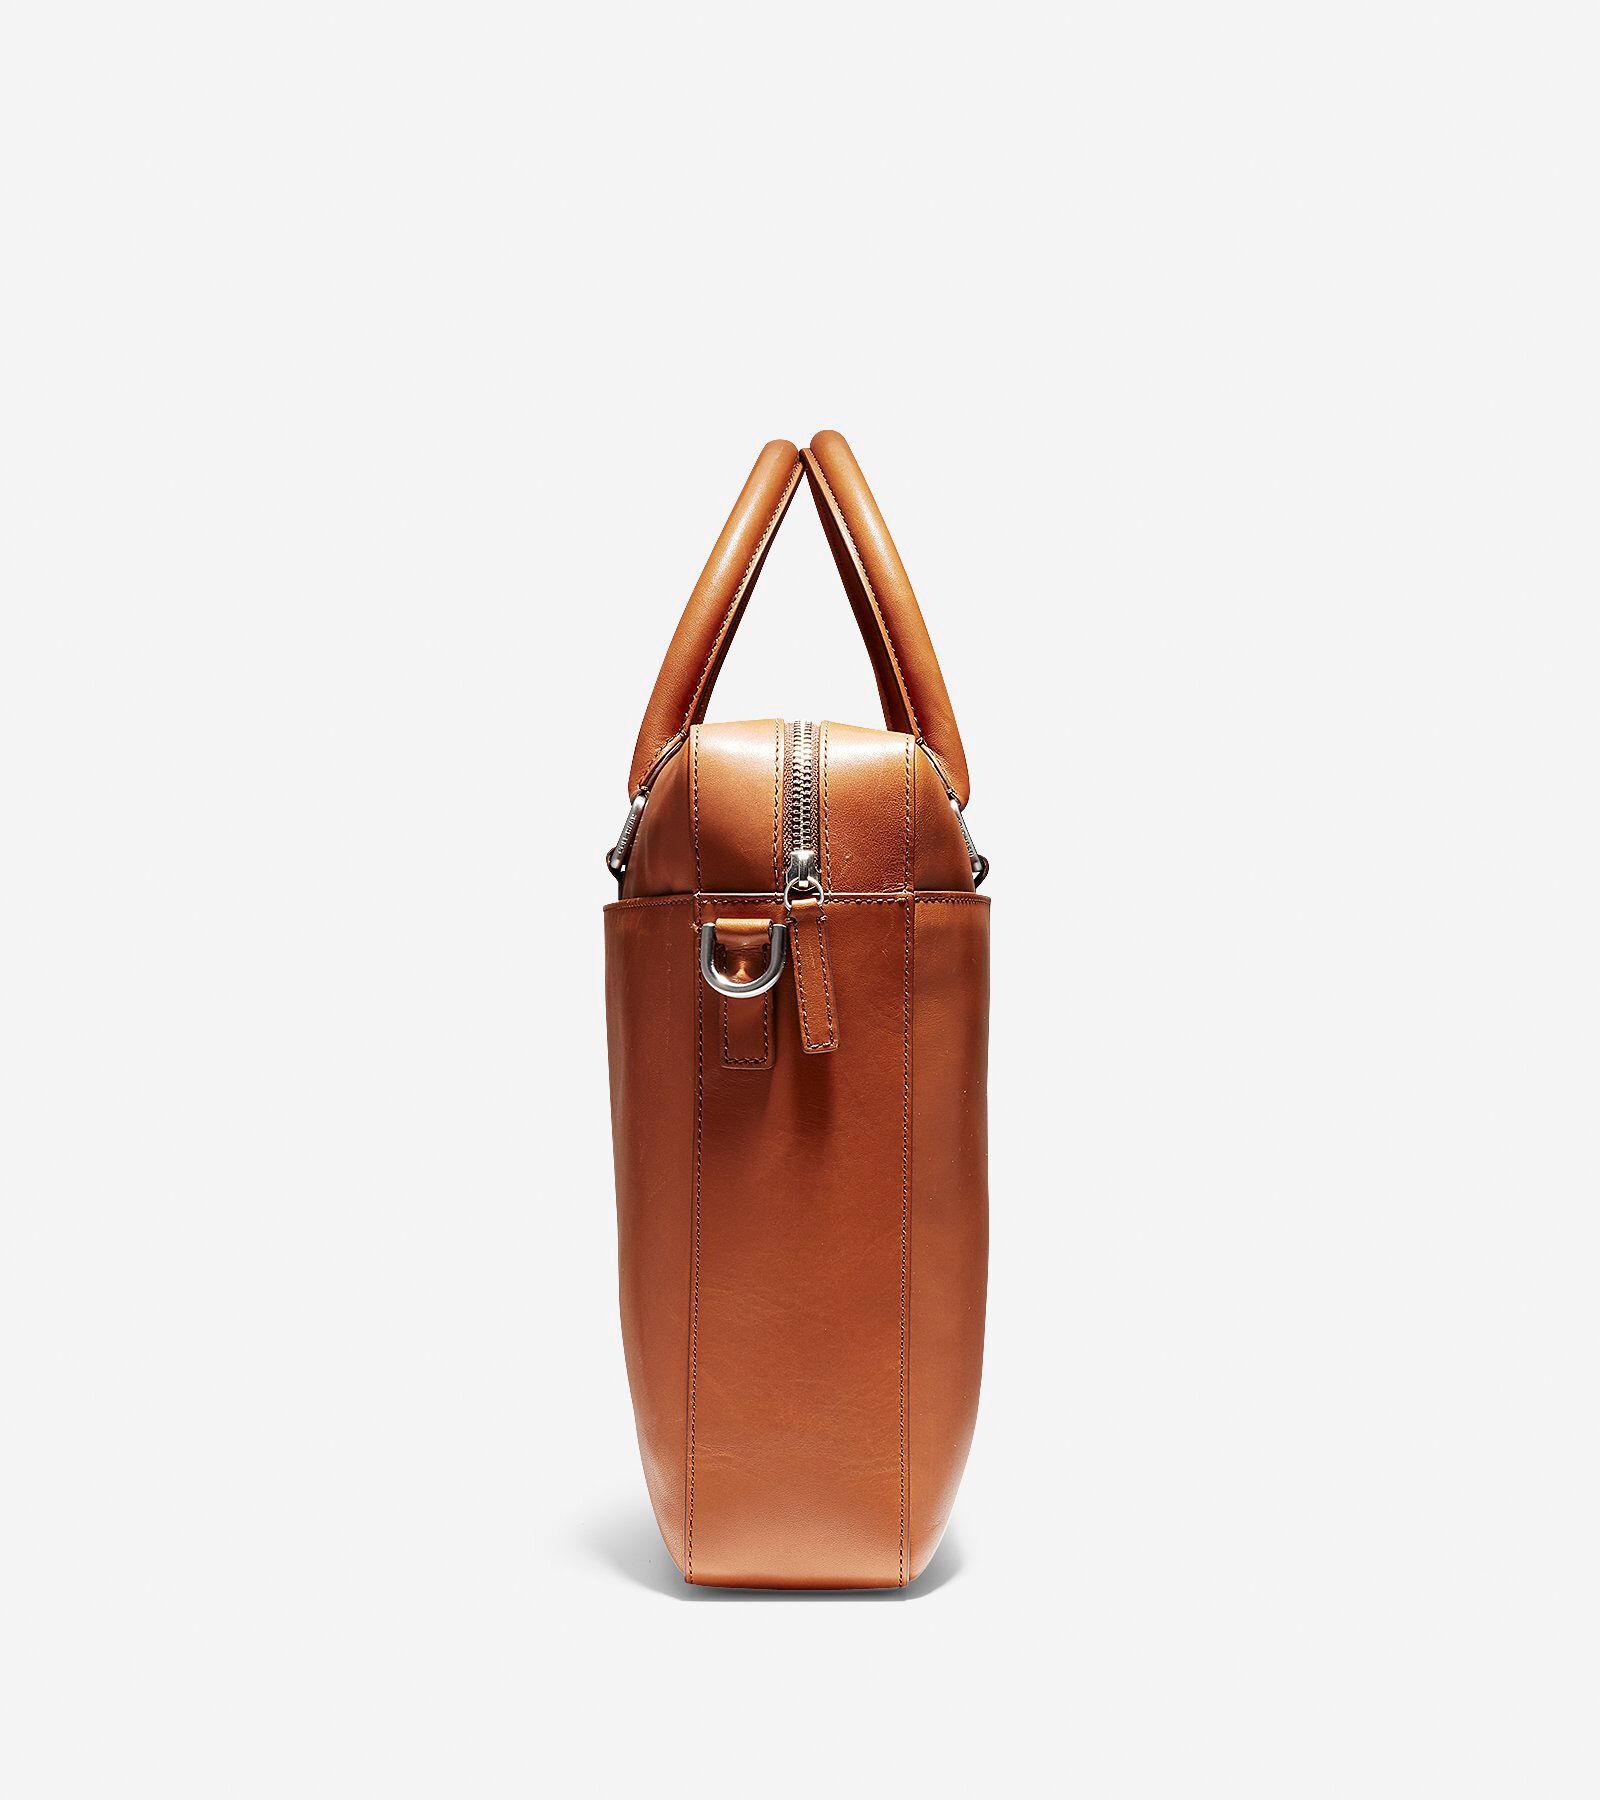 Warner Attaché in British Tan Leather